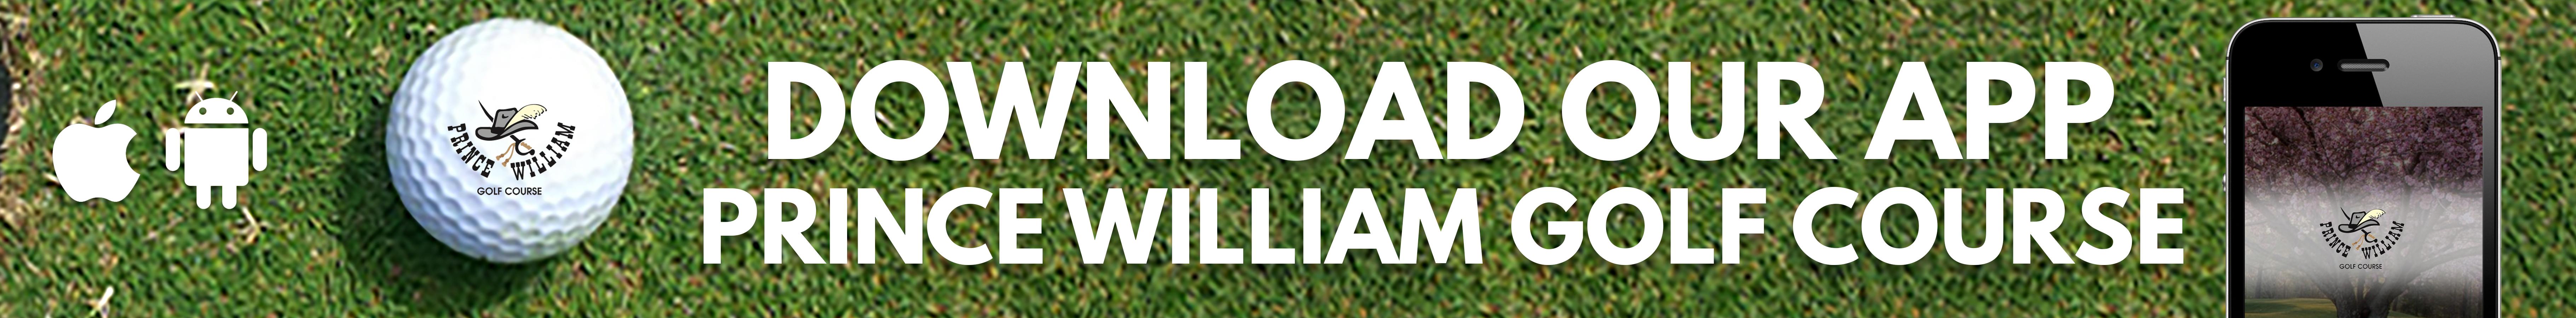 Prince William Golf App